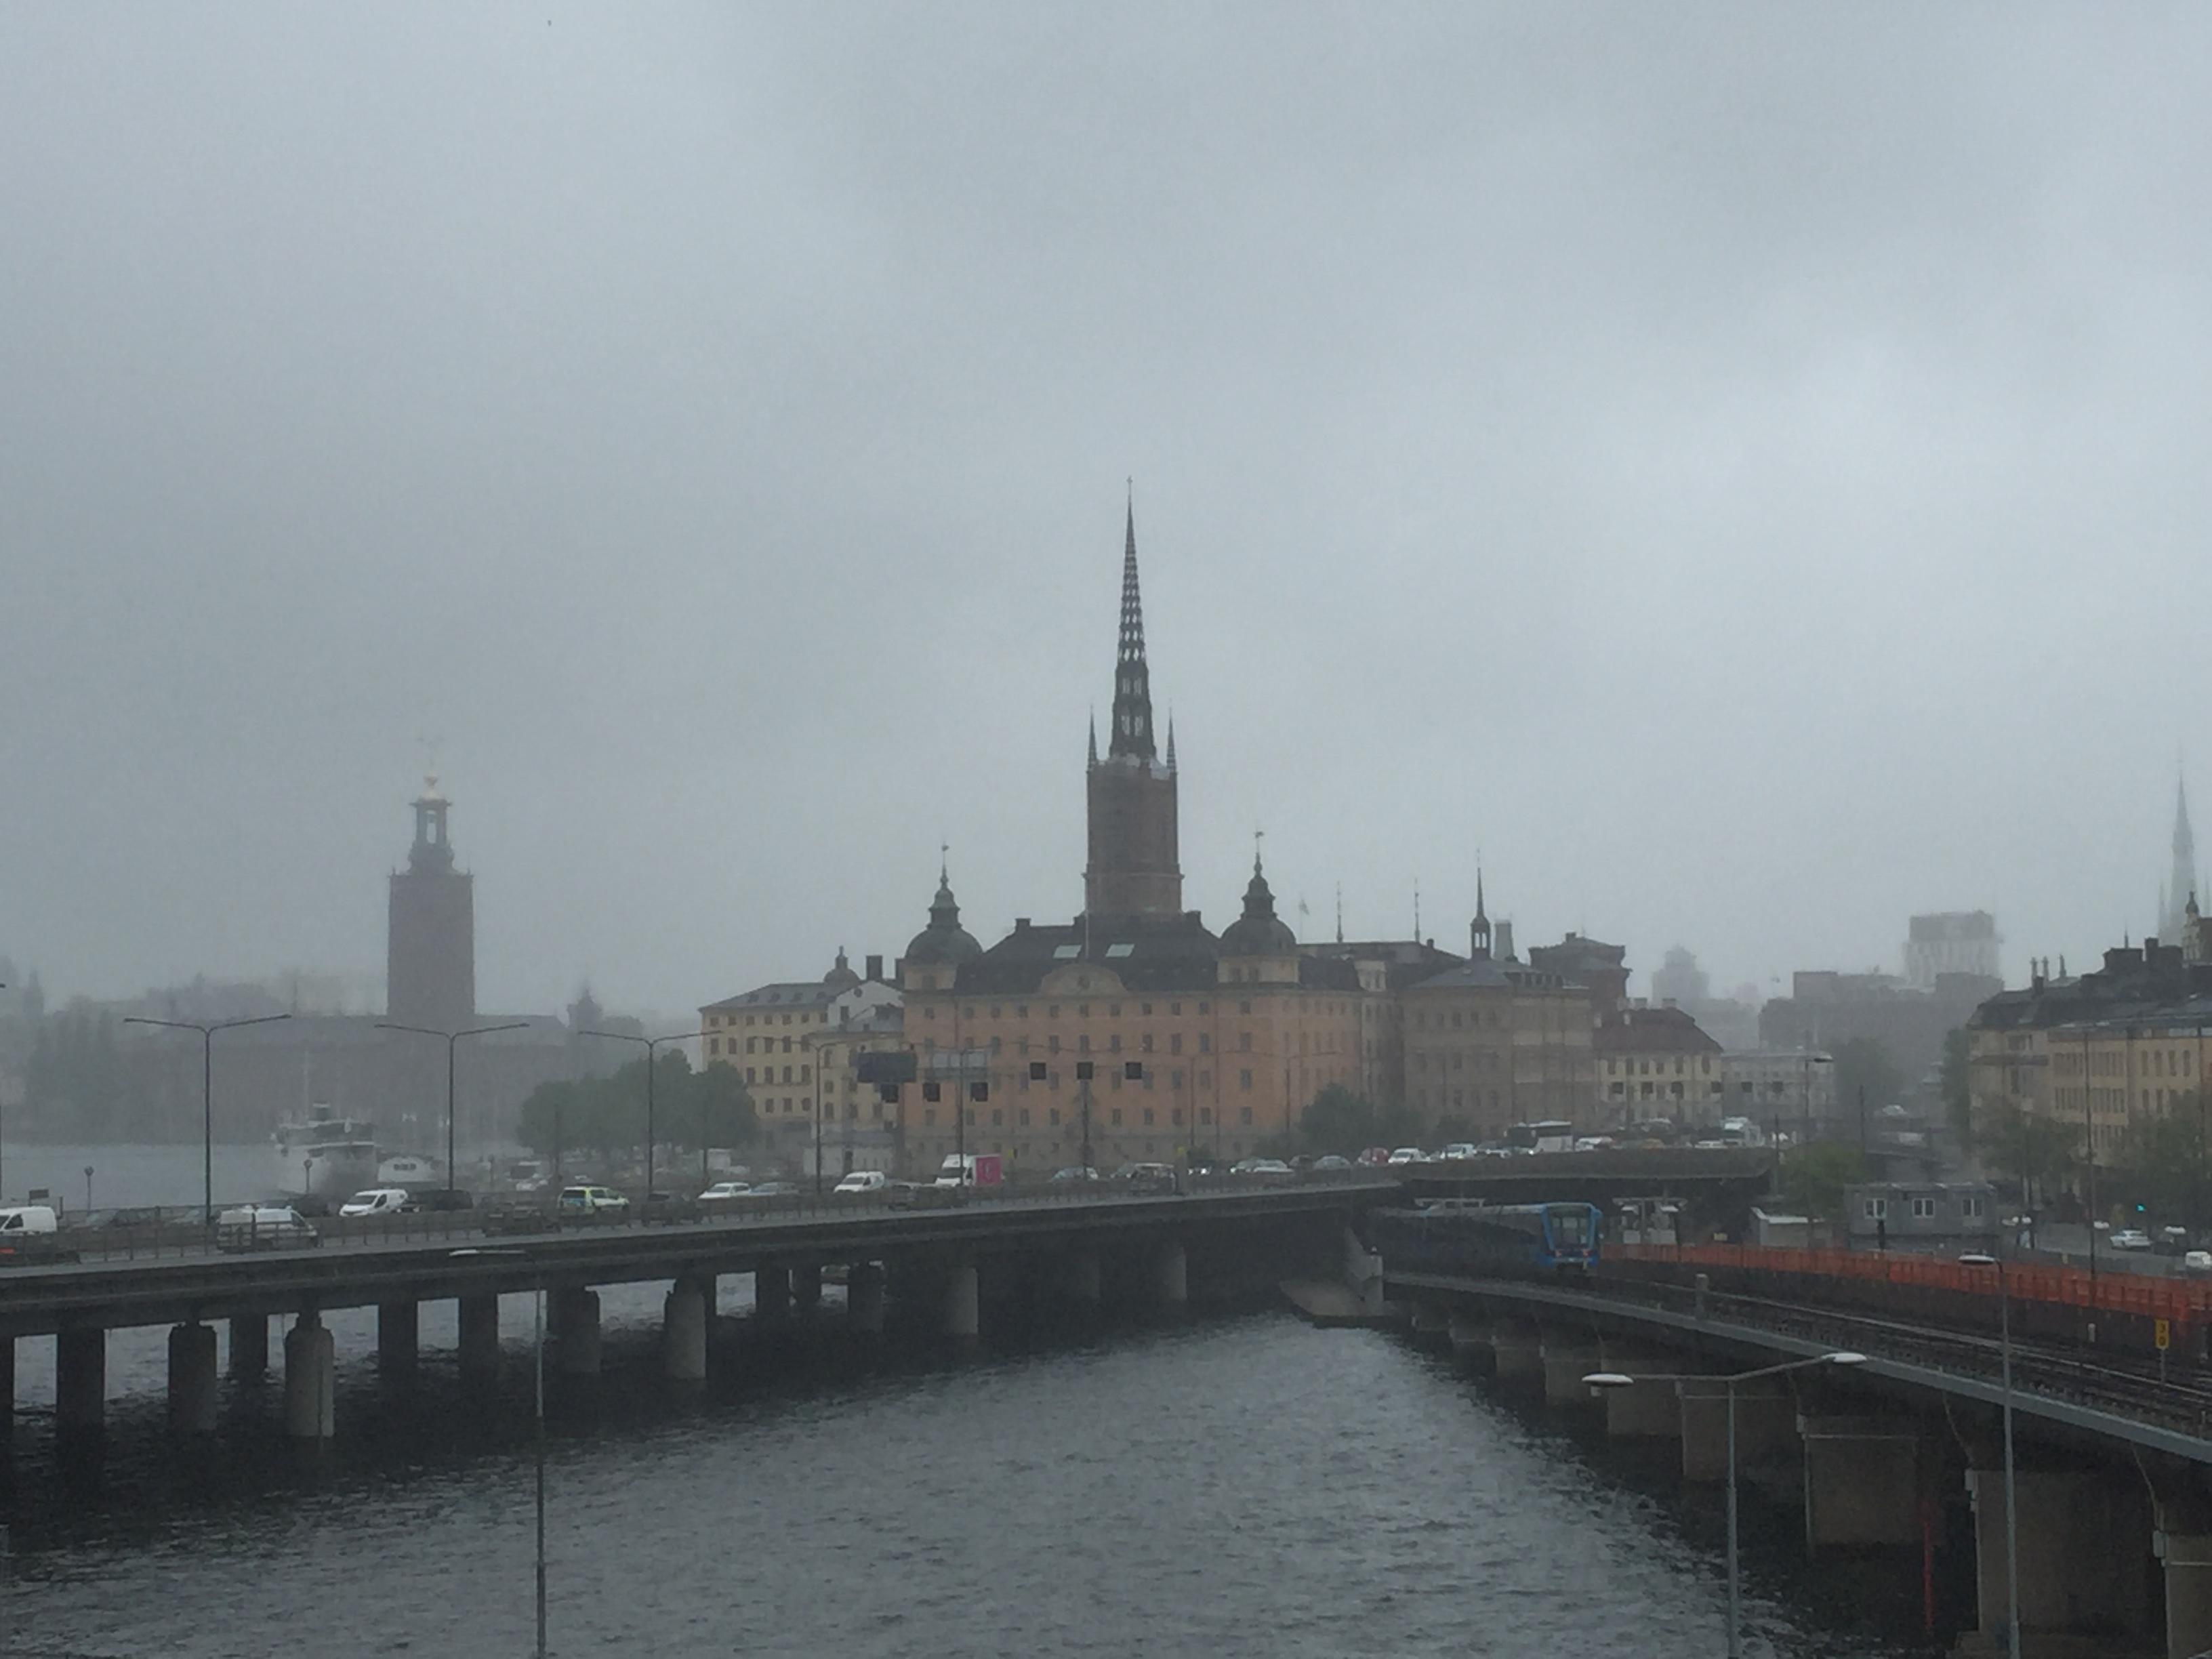 Pretty, rainy Stockholm.